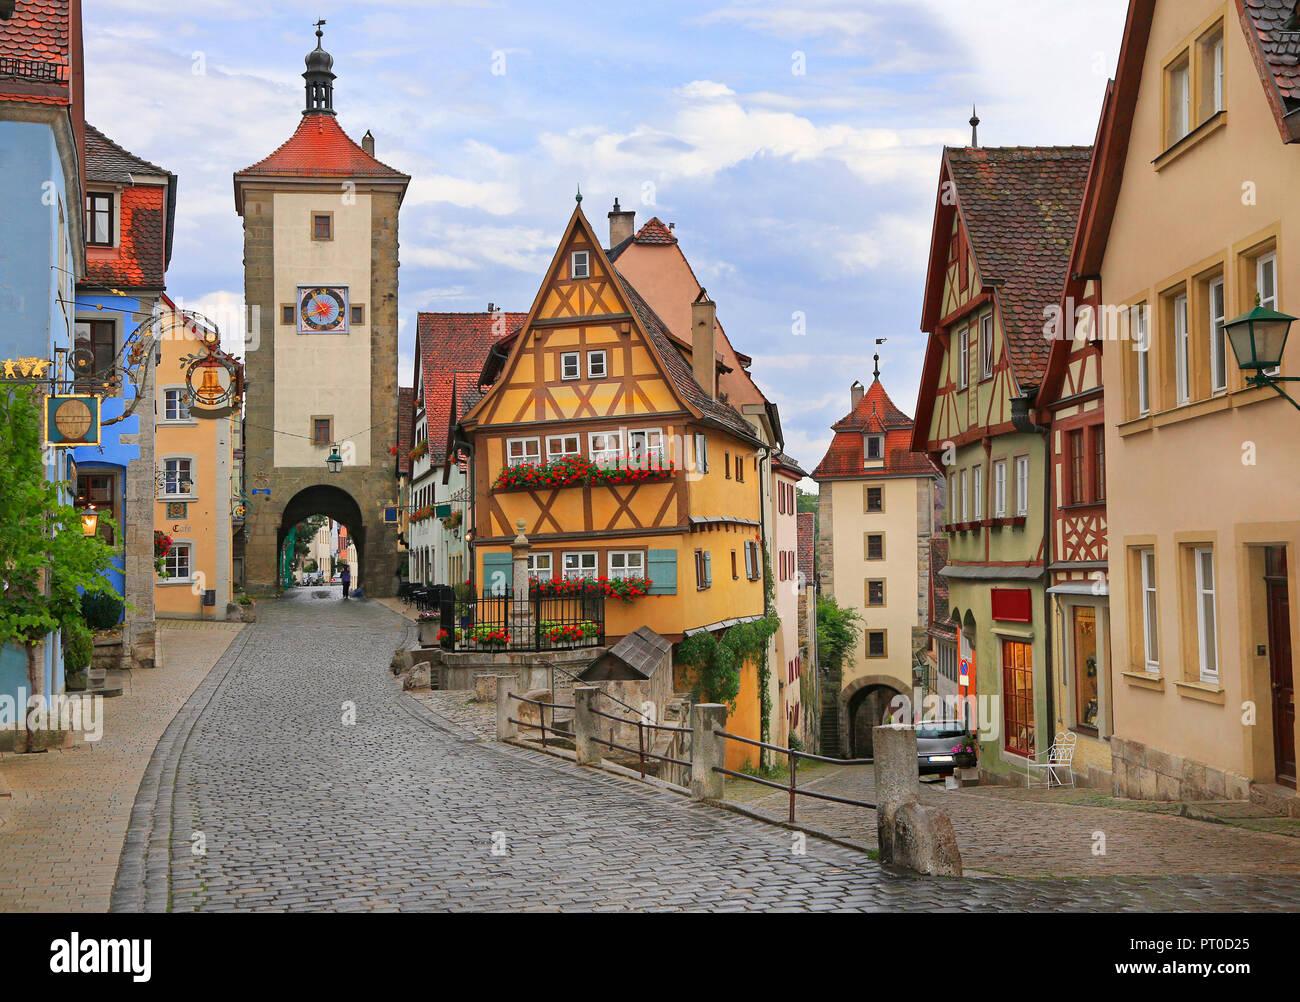 Ob tauber rothenburg der Rothenburg on